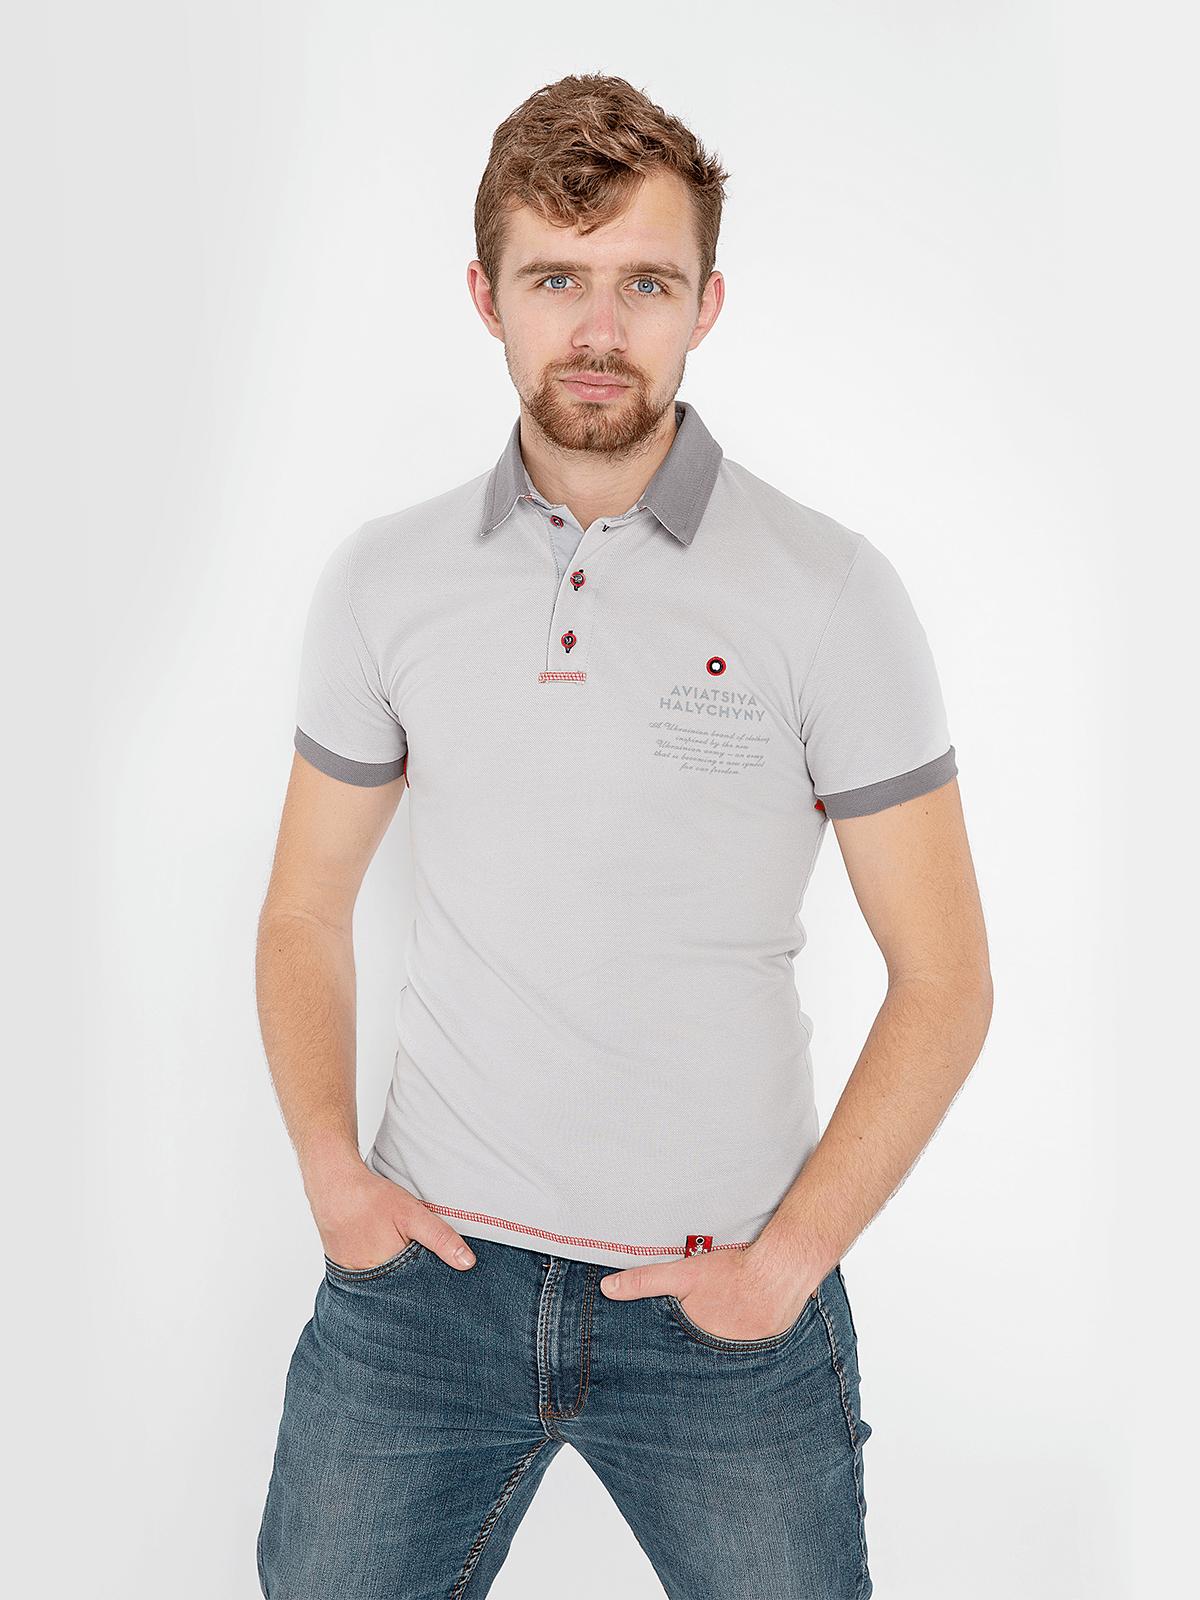 Men's Polo Shirt Wings. Color світло-сірий. Unisex polo (men's sizes).